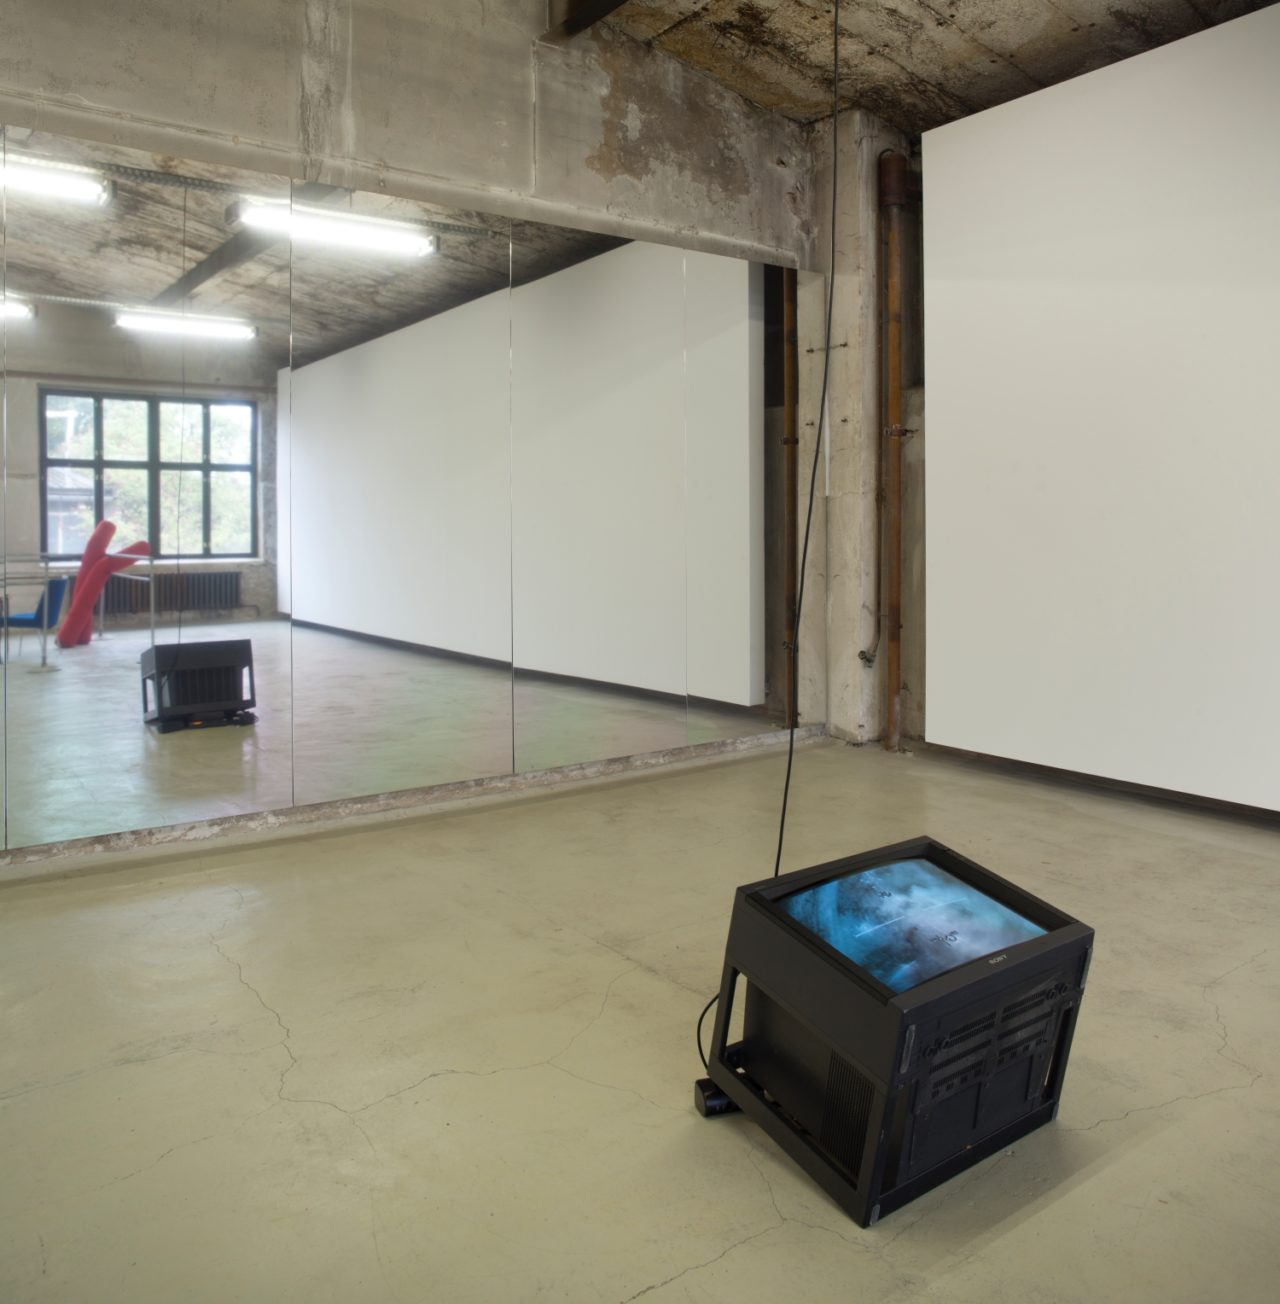 Wall: Heimo Zobernig, untitled (2000); Floor: Christoph Büchel, AC-130 gunship targeting video (2004)